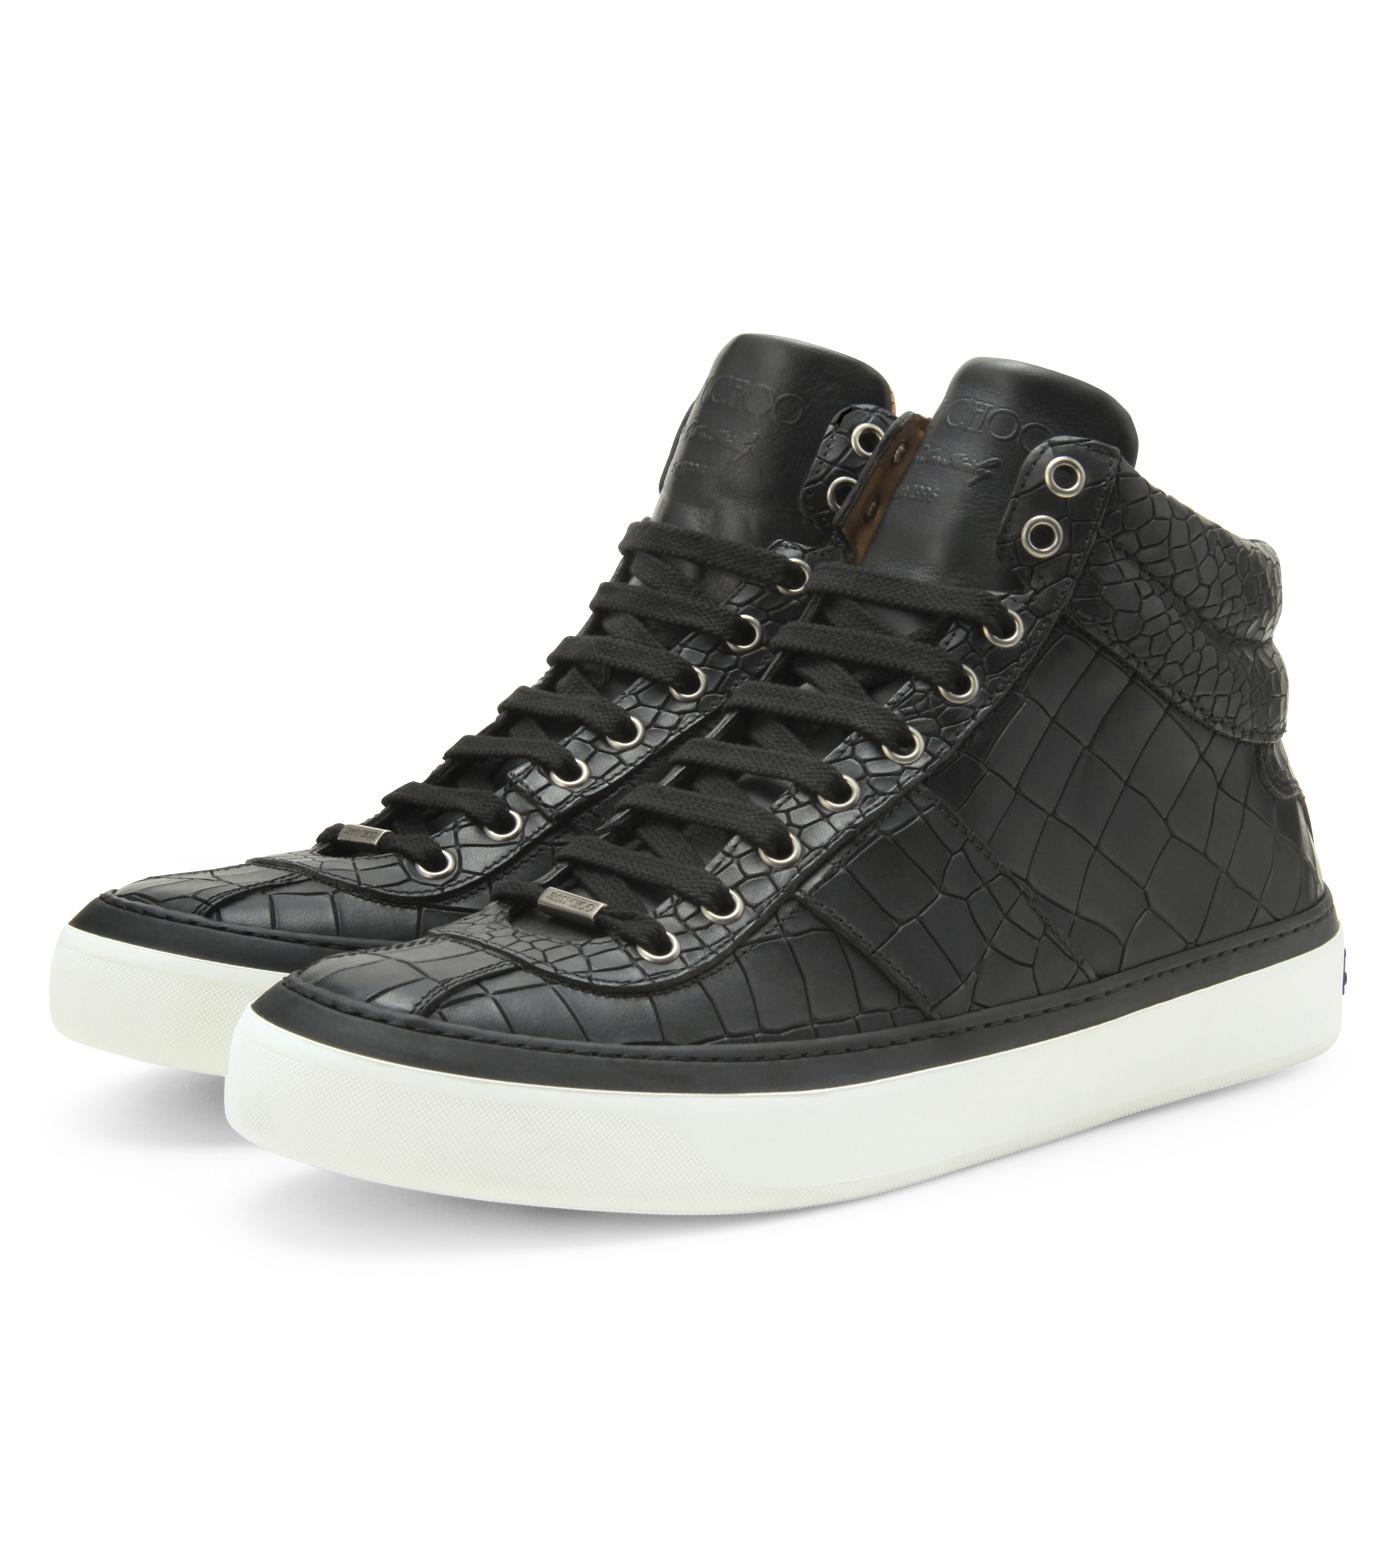 Jimmy Choo(ジミーチュウ)のCroco emboss sneaker-BLACK-BELGRAVI-CCL-13 拡大詳細画像4